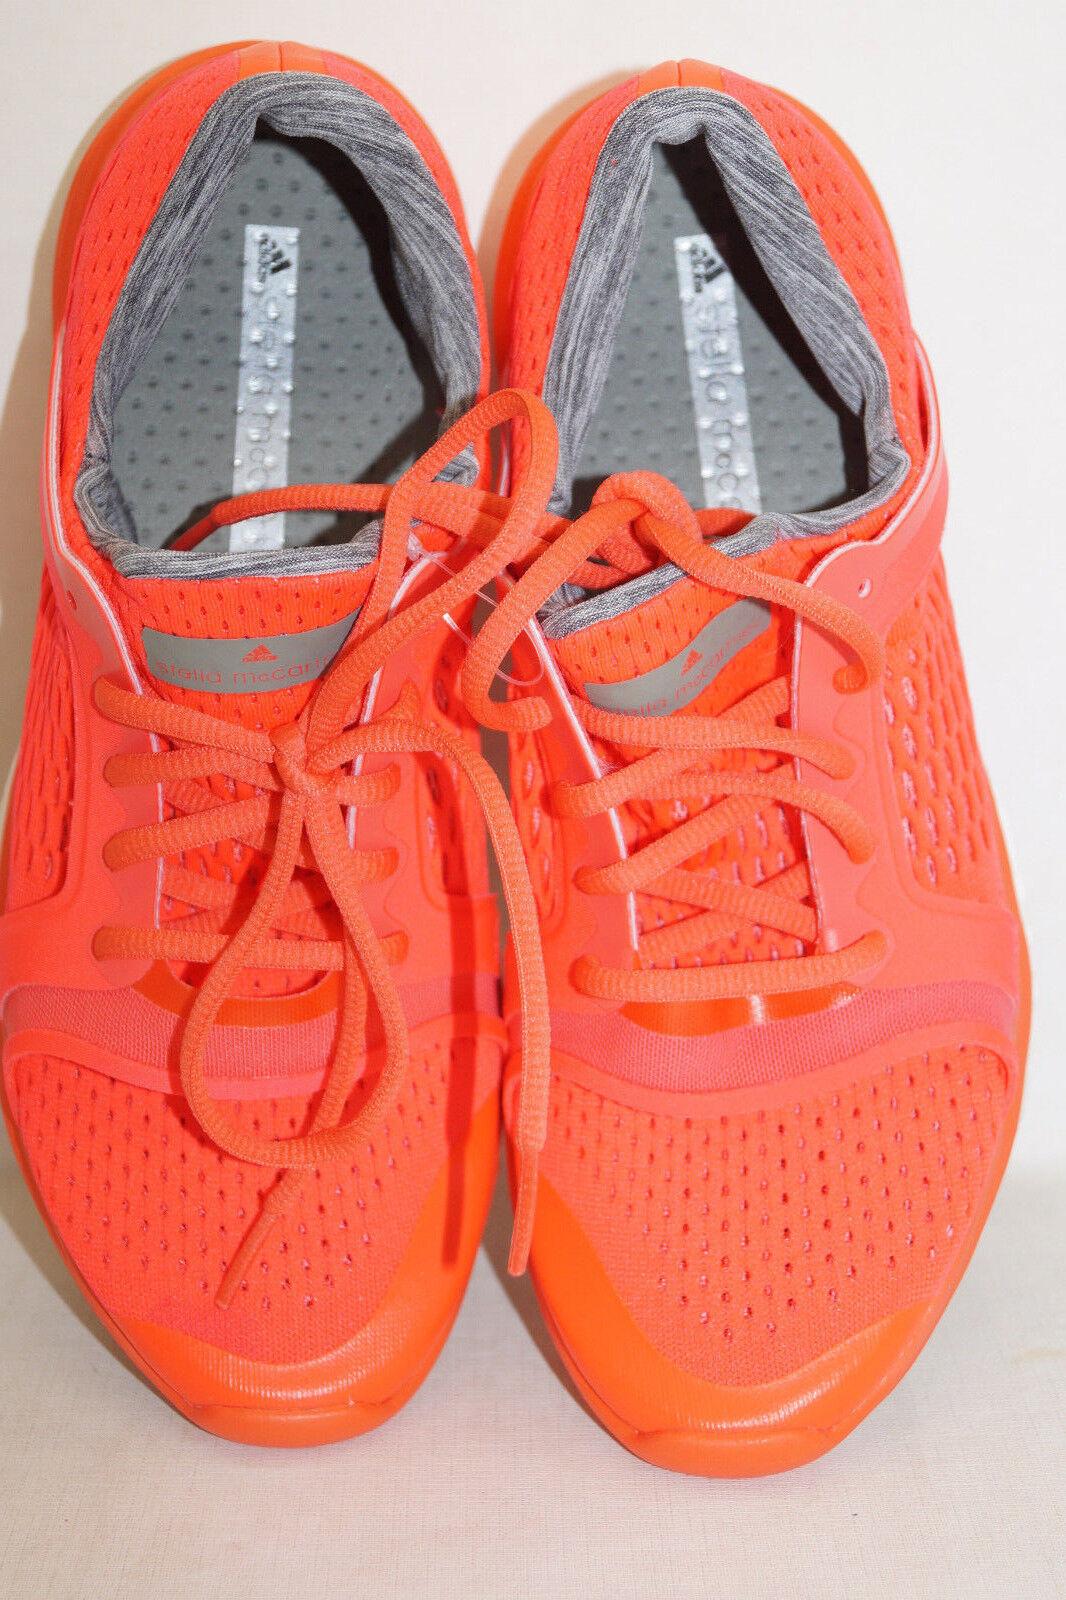 Adidas CC SONIC BOOST WMNS LAUF JOGGING SCHUHE SCHUHE SCHUHE EU.38.6 UK.5.5  Stella Mc Cartney  | Preisreduktion  d9f8fd